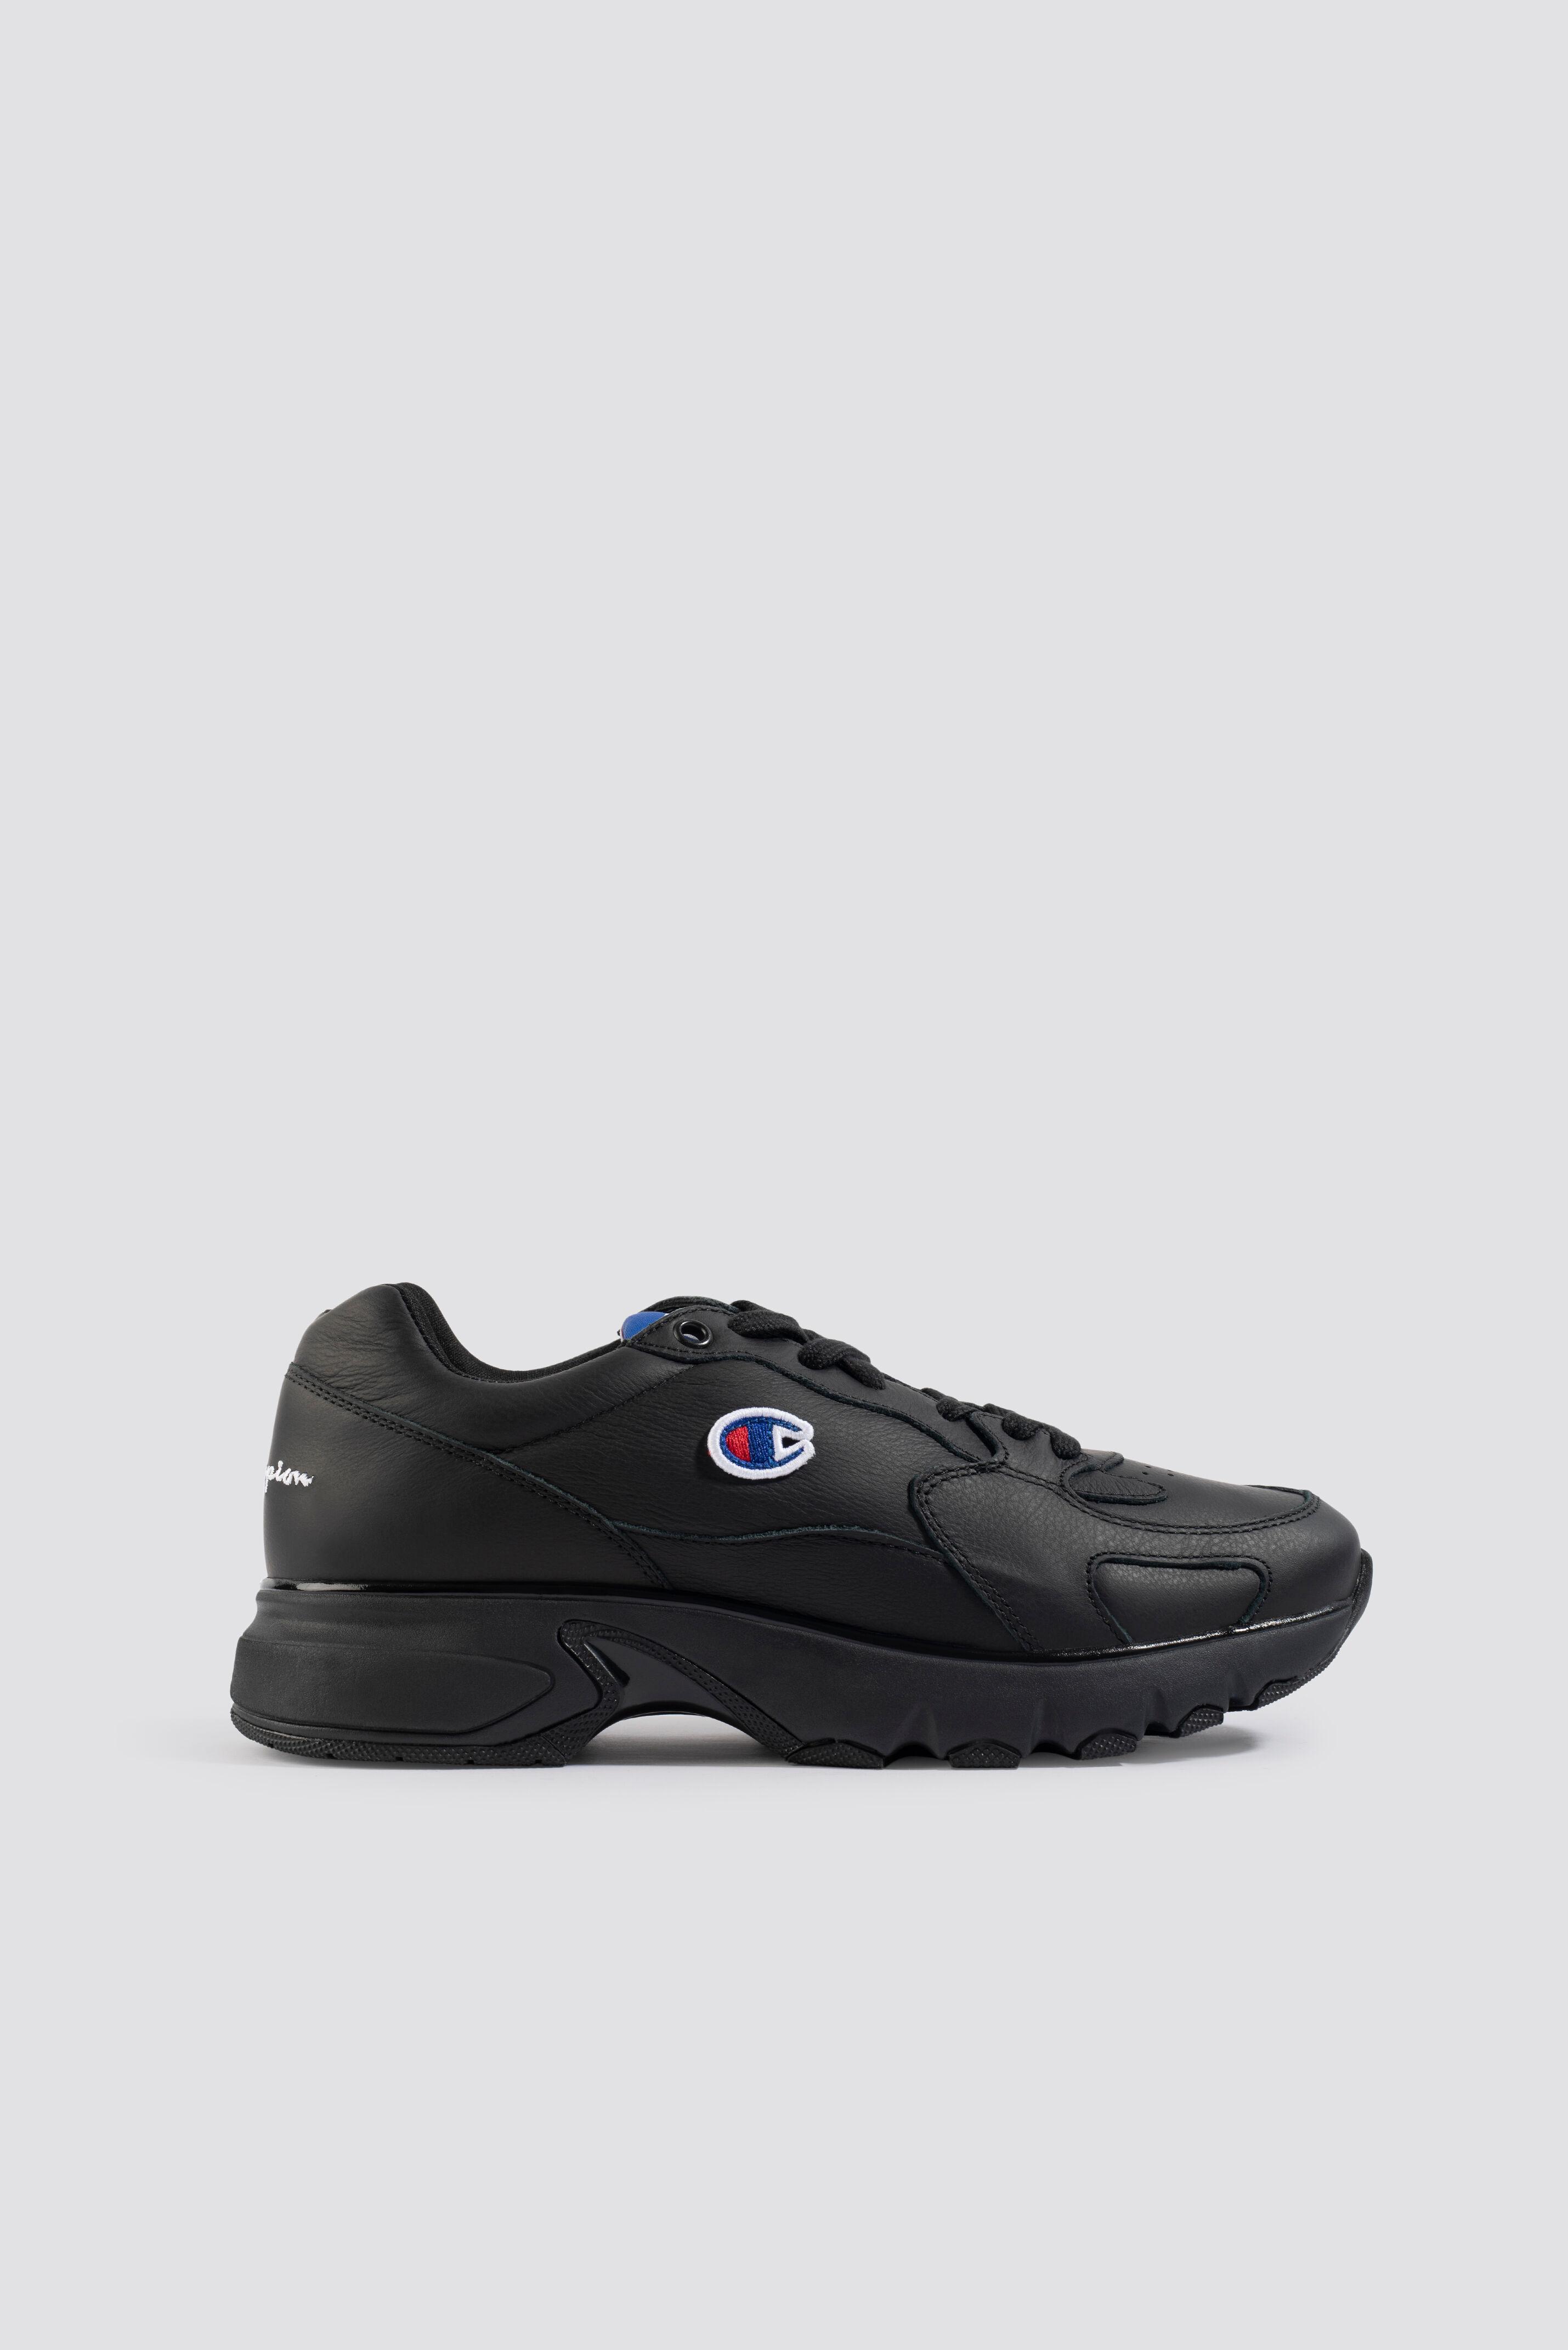 Champion Cwa Low Cut Leather Sneaker - Black  - Size: EU 36,EU 36.5,EU 37.5,EU 38,EU 38.5,EU 39,EU 40,E